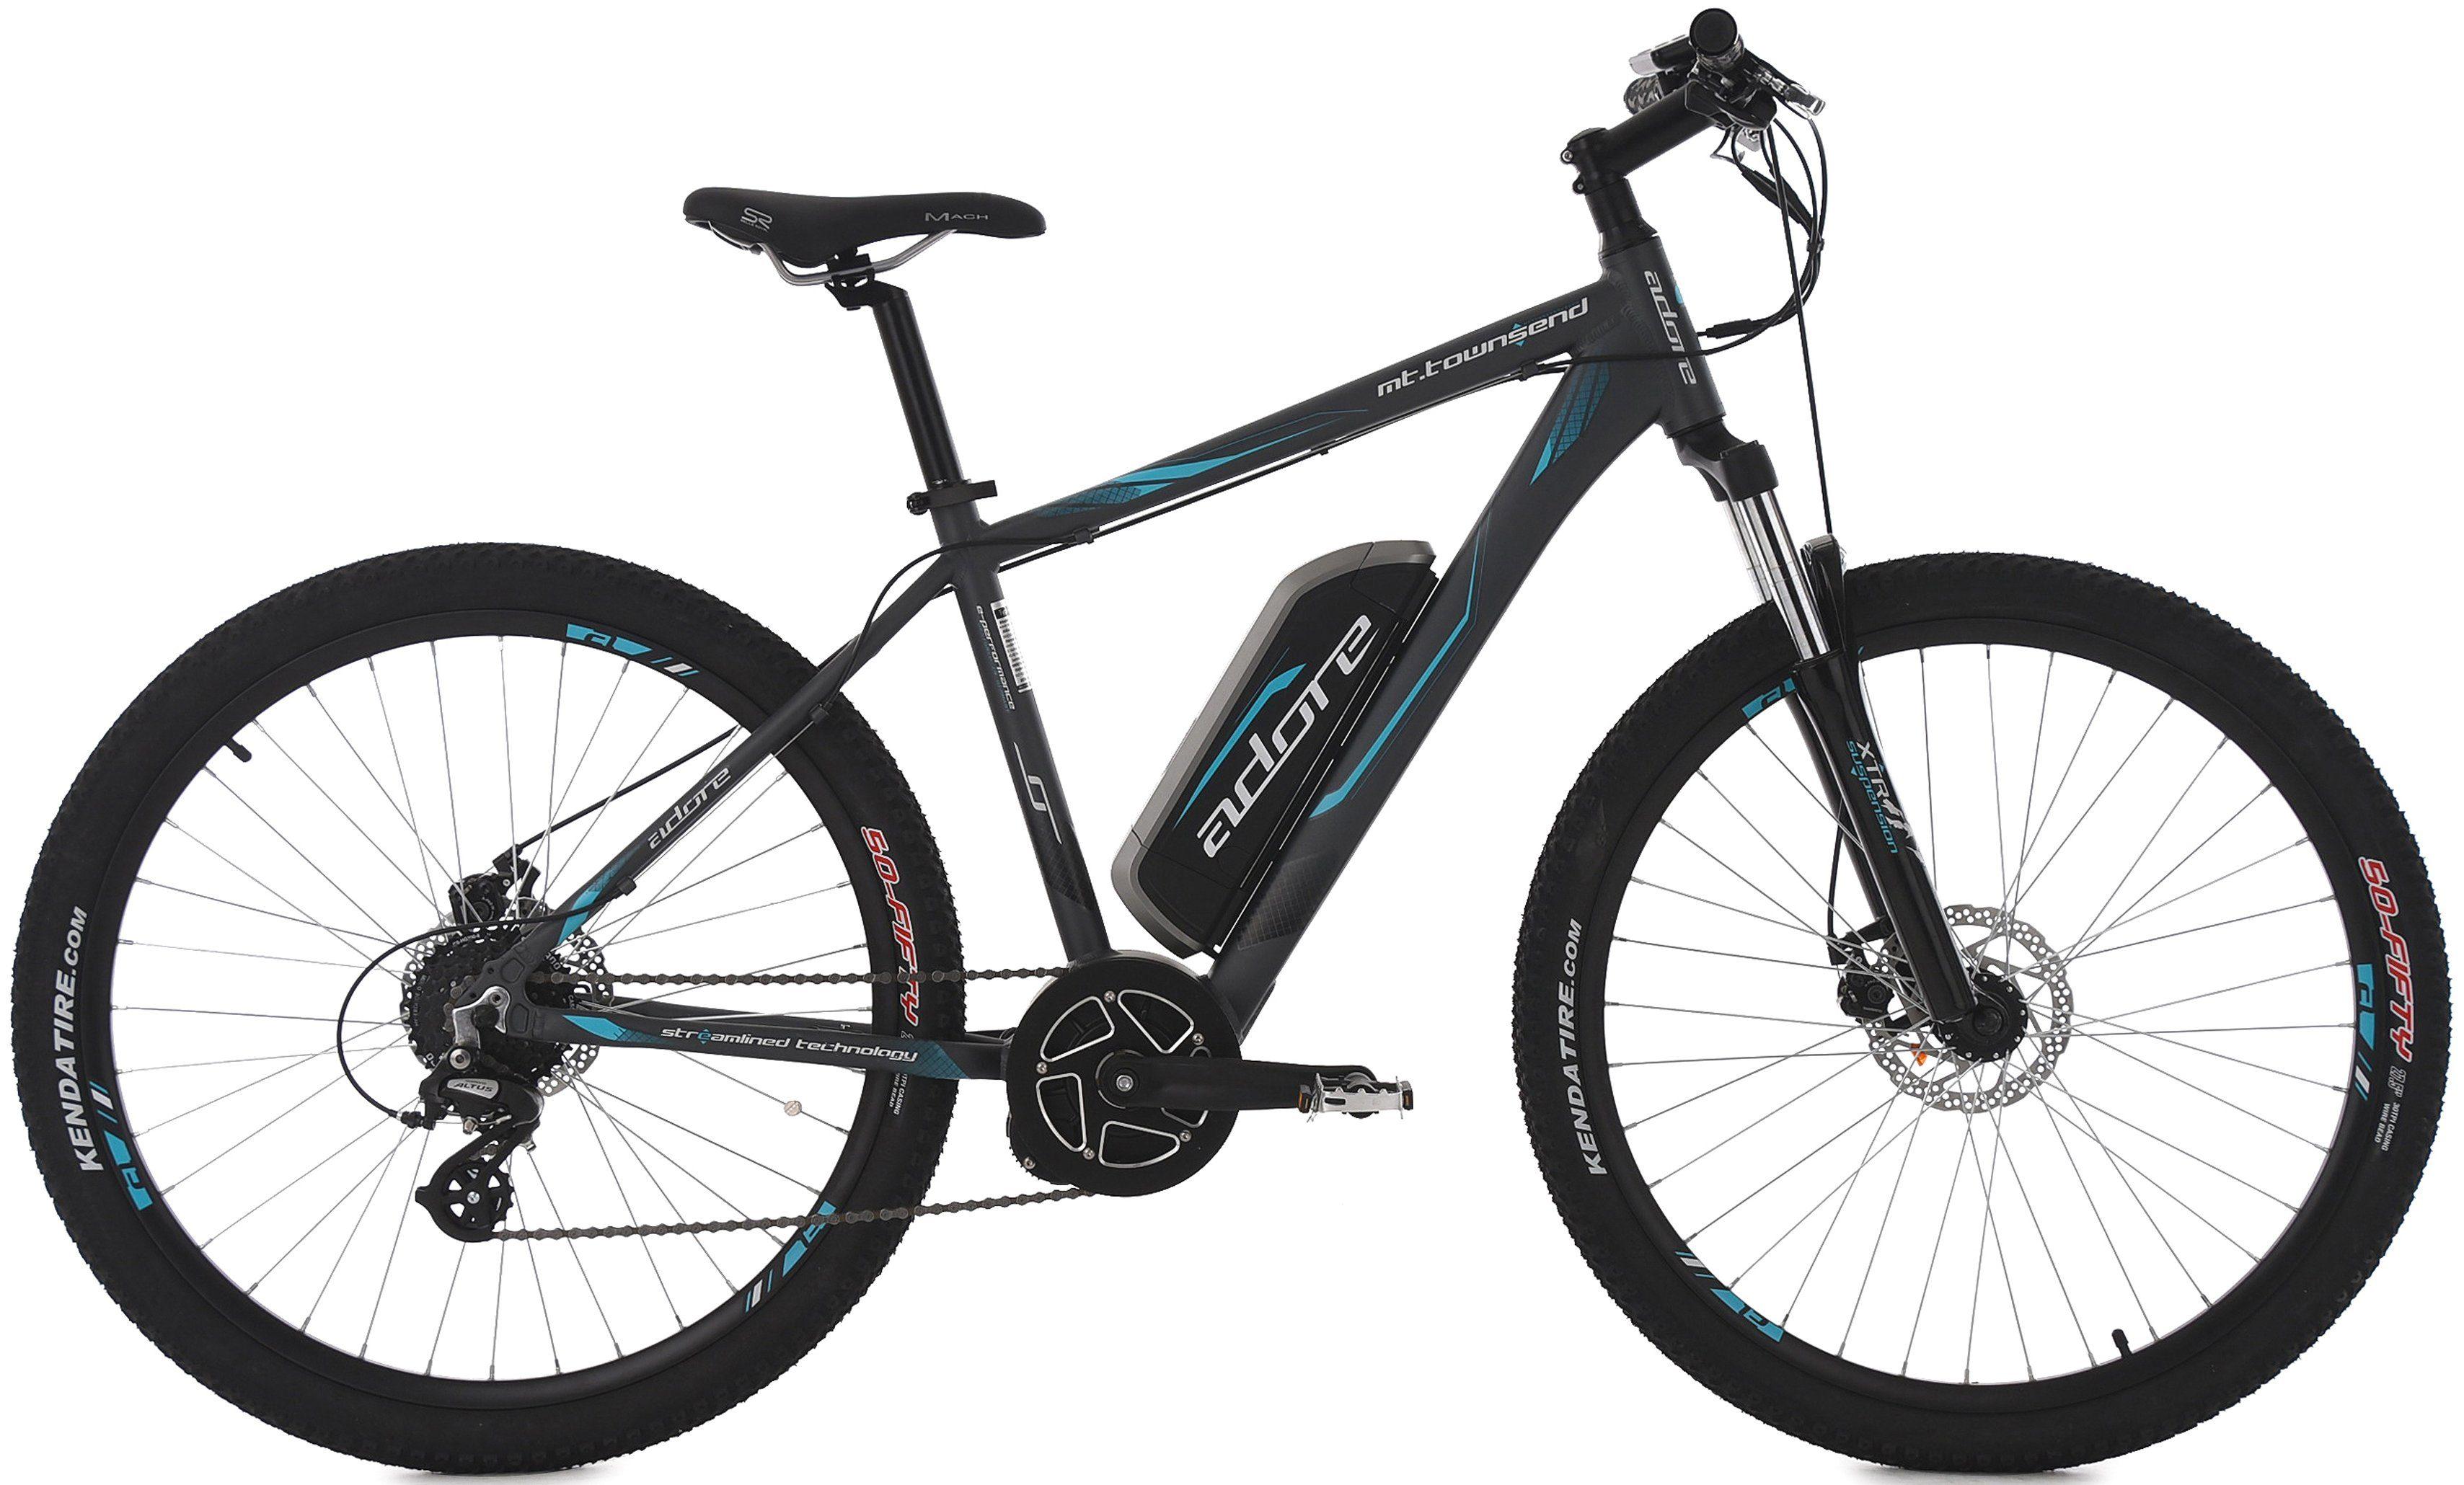 Adore MTB E-Bike, 27,5 Zoll, 8 Gang Shimano Altus, Mittelmotor, 374 W, 36V/10,4 Ah, »Townsend«